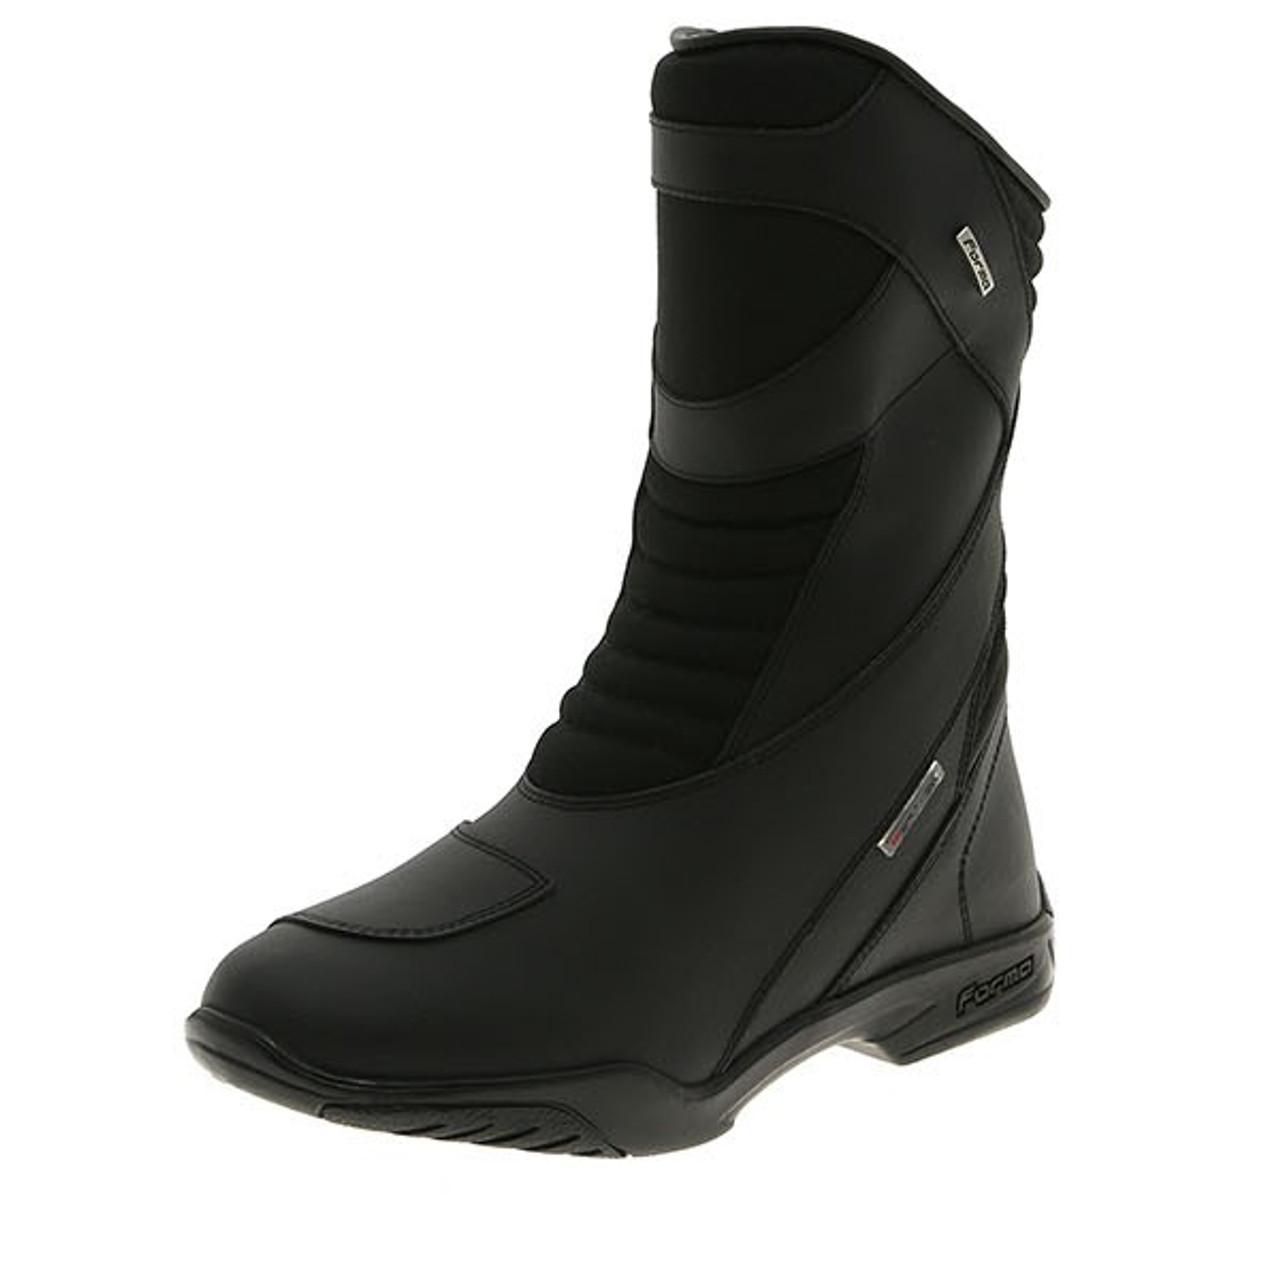 Forma Nero Motorcycle Boots, Mens, Black, Waterproof